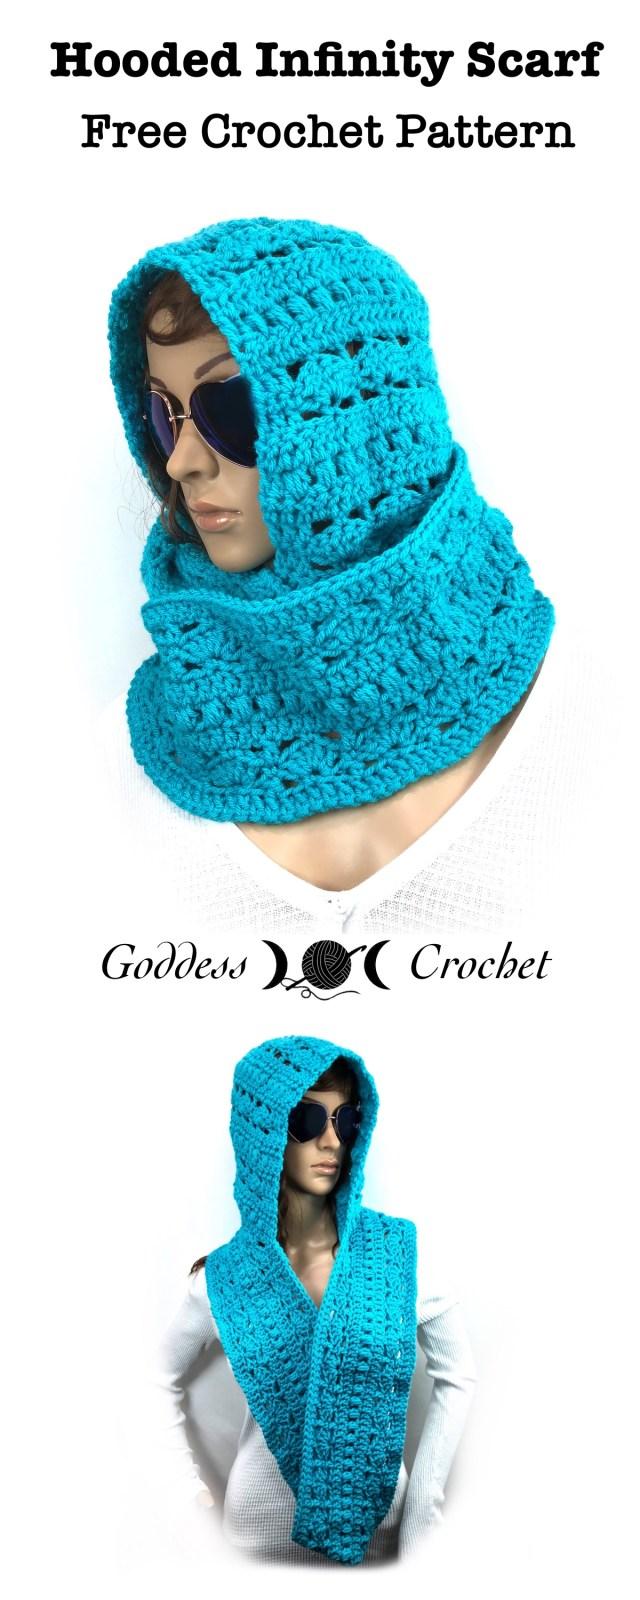 Hooded Infinity Scarf Free Crochet Pattern Goddess Crochet